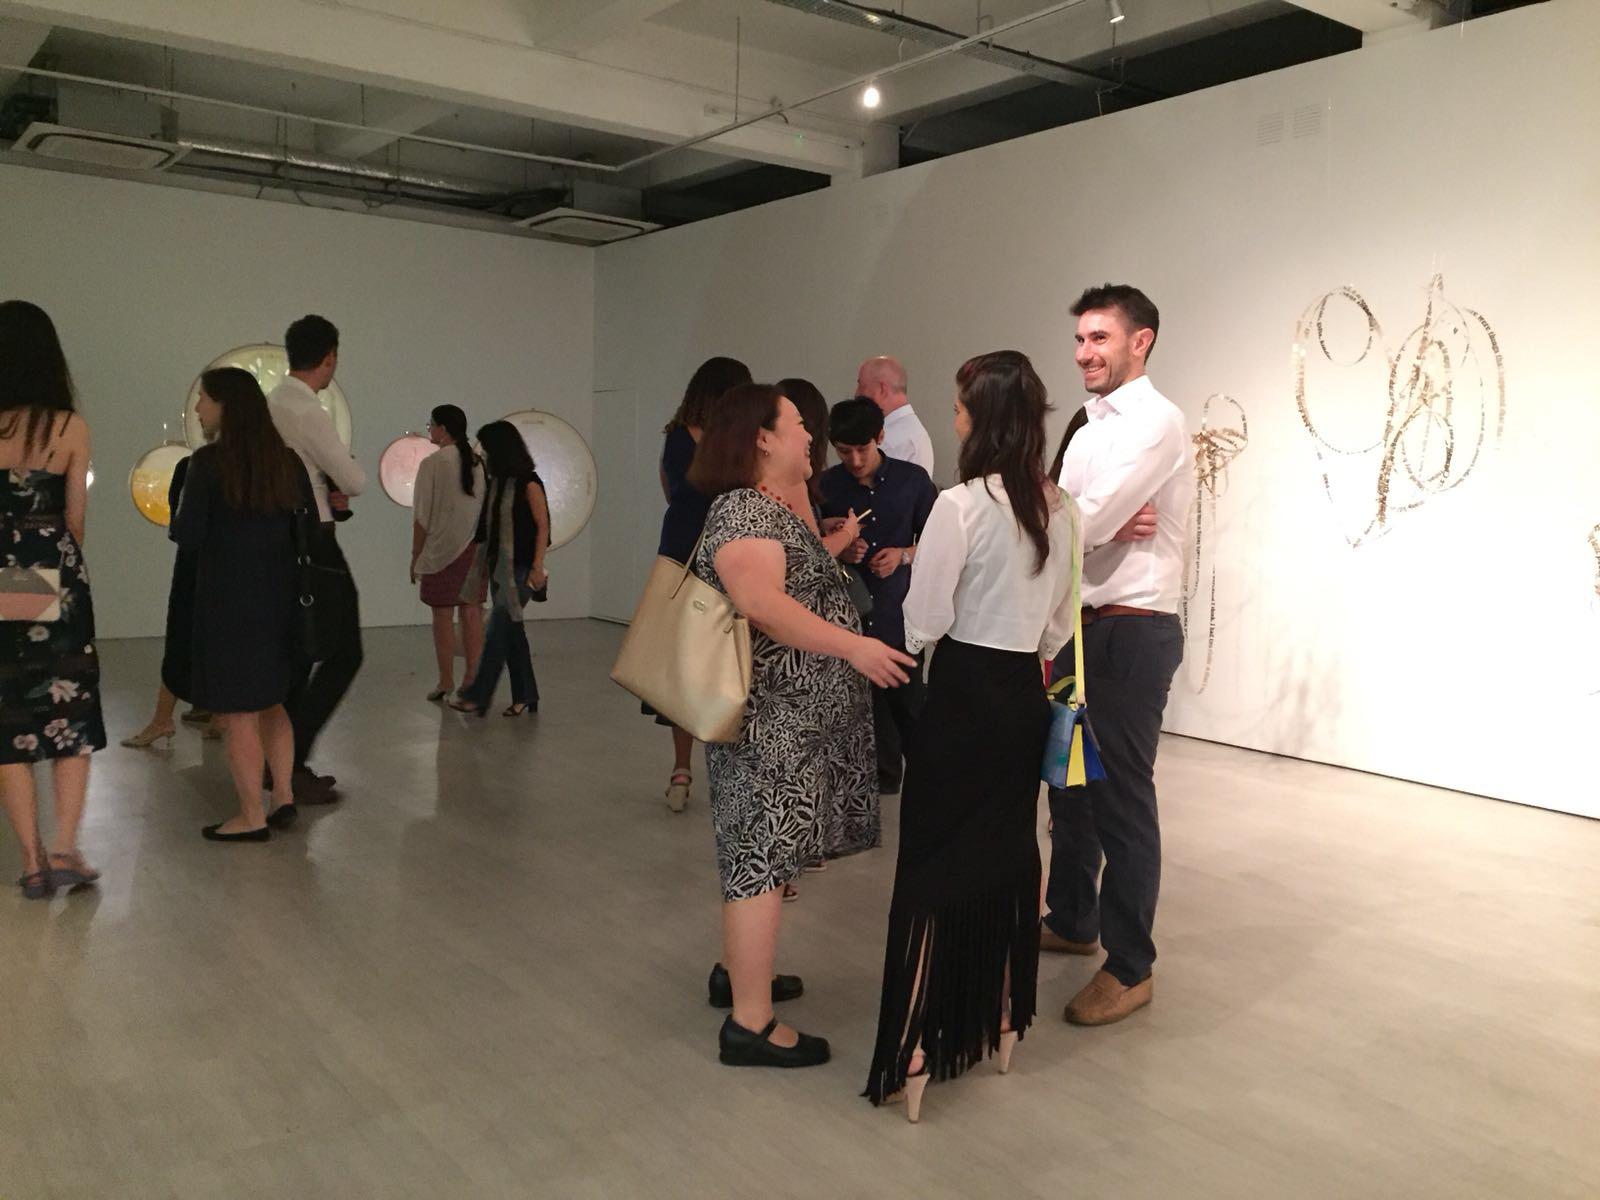 SOLO EXHIBITION OPENING_NICOLA ANTHONY_SINGAPORE ART MUSEUM 6.JPG